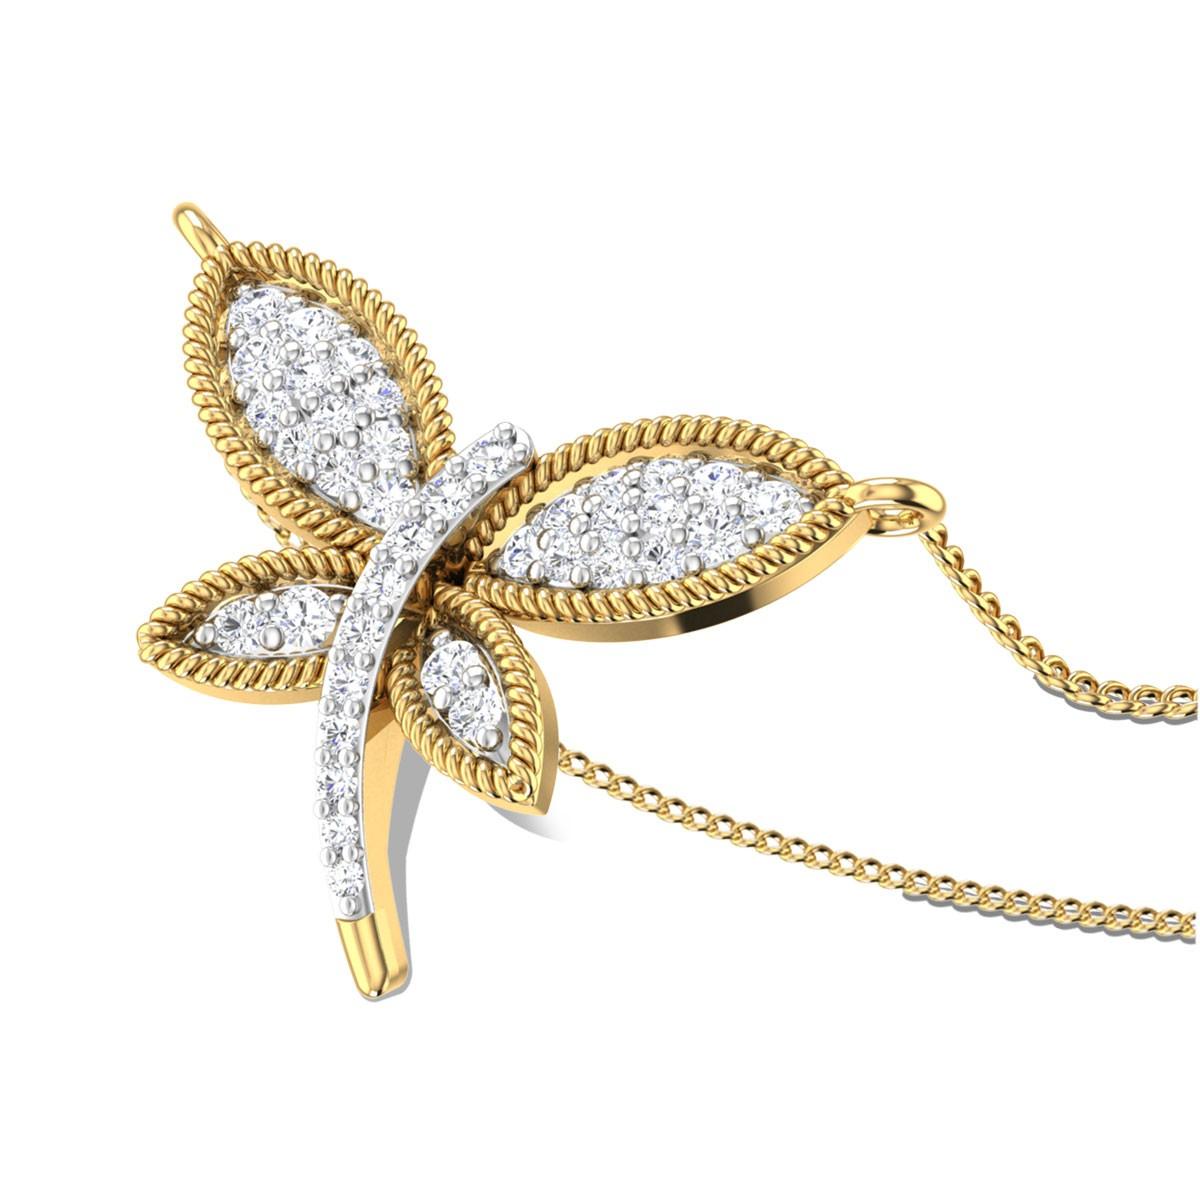 Firefly Spark Diamond Pendant